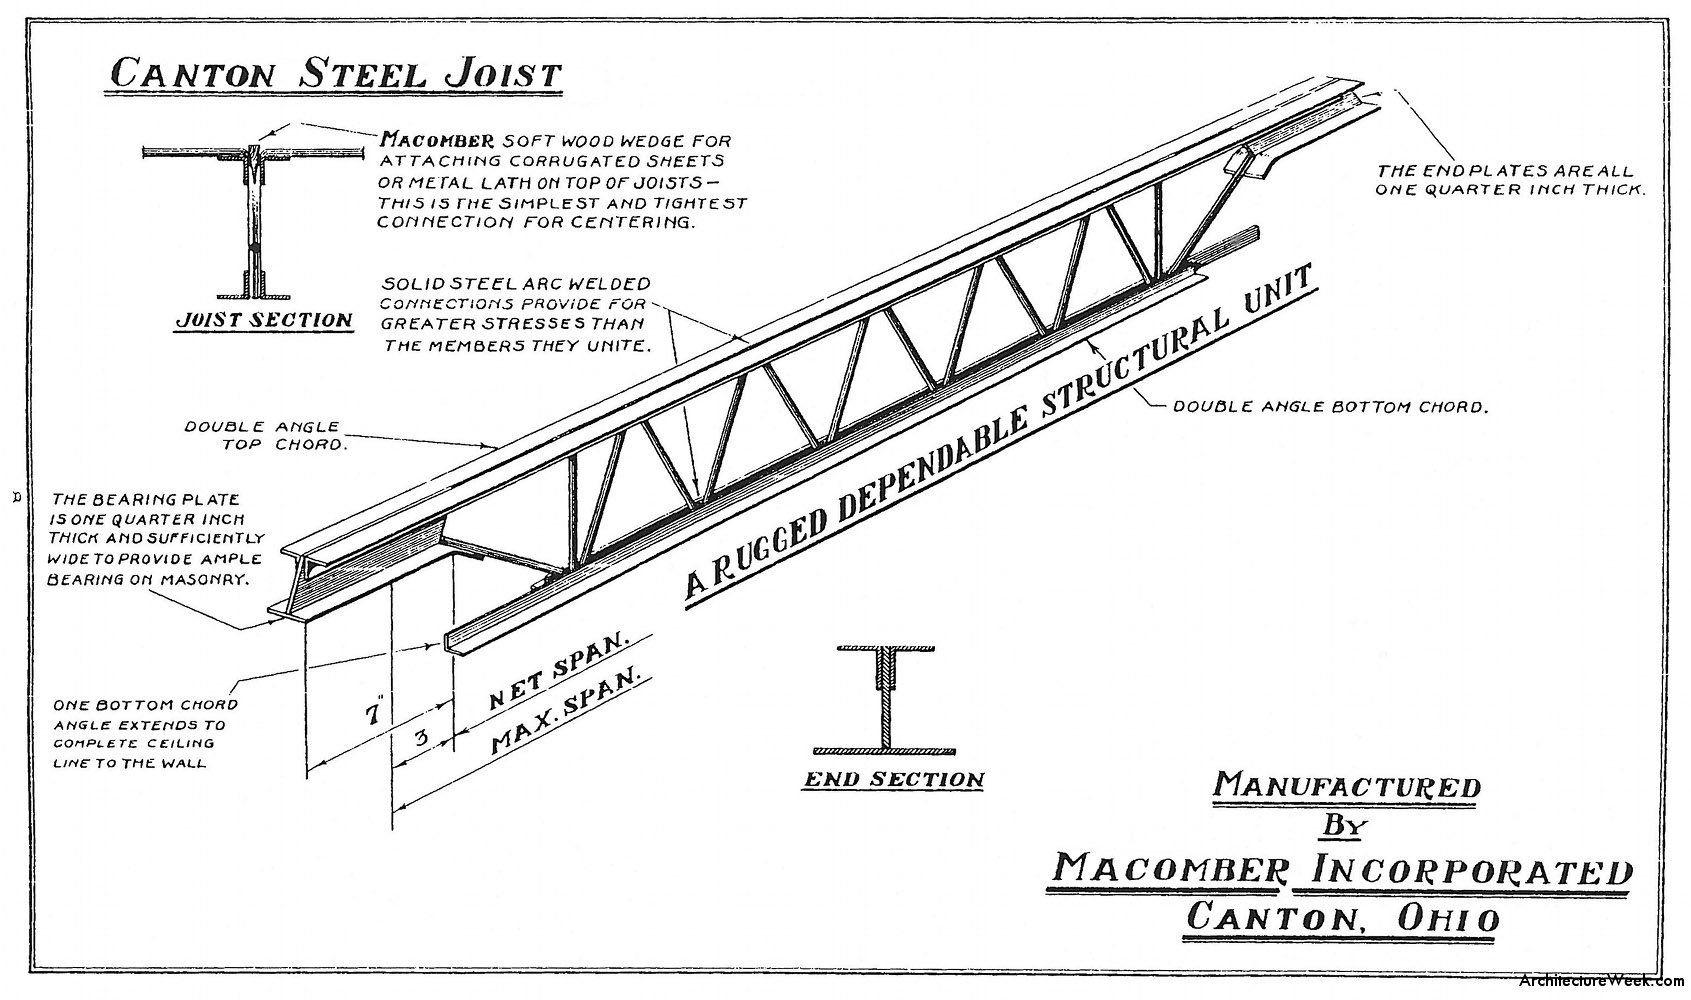 ArchitectureWeek Image - Open-Web Steel Joists | Steel | Steel